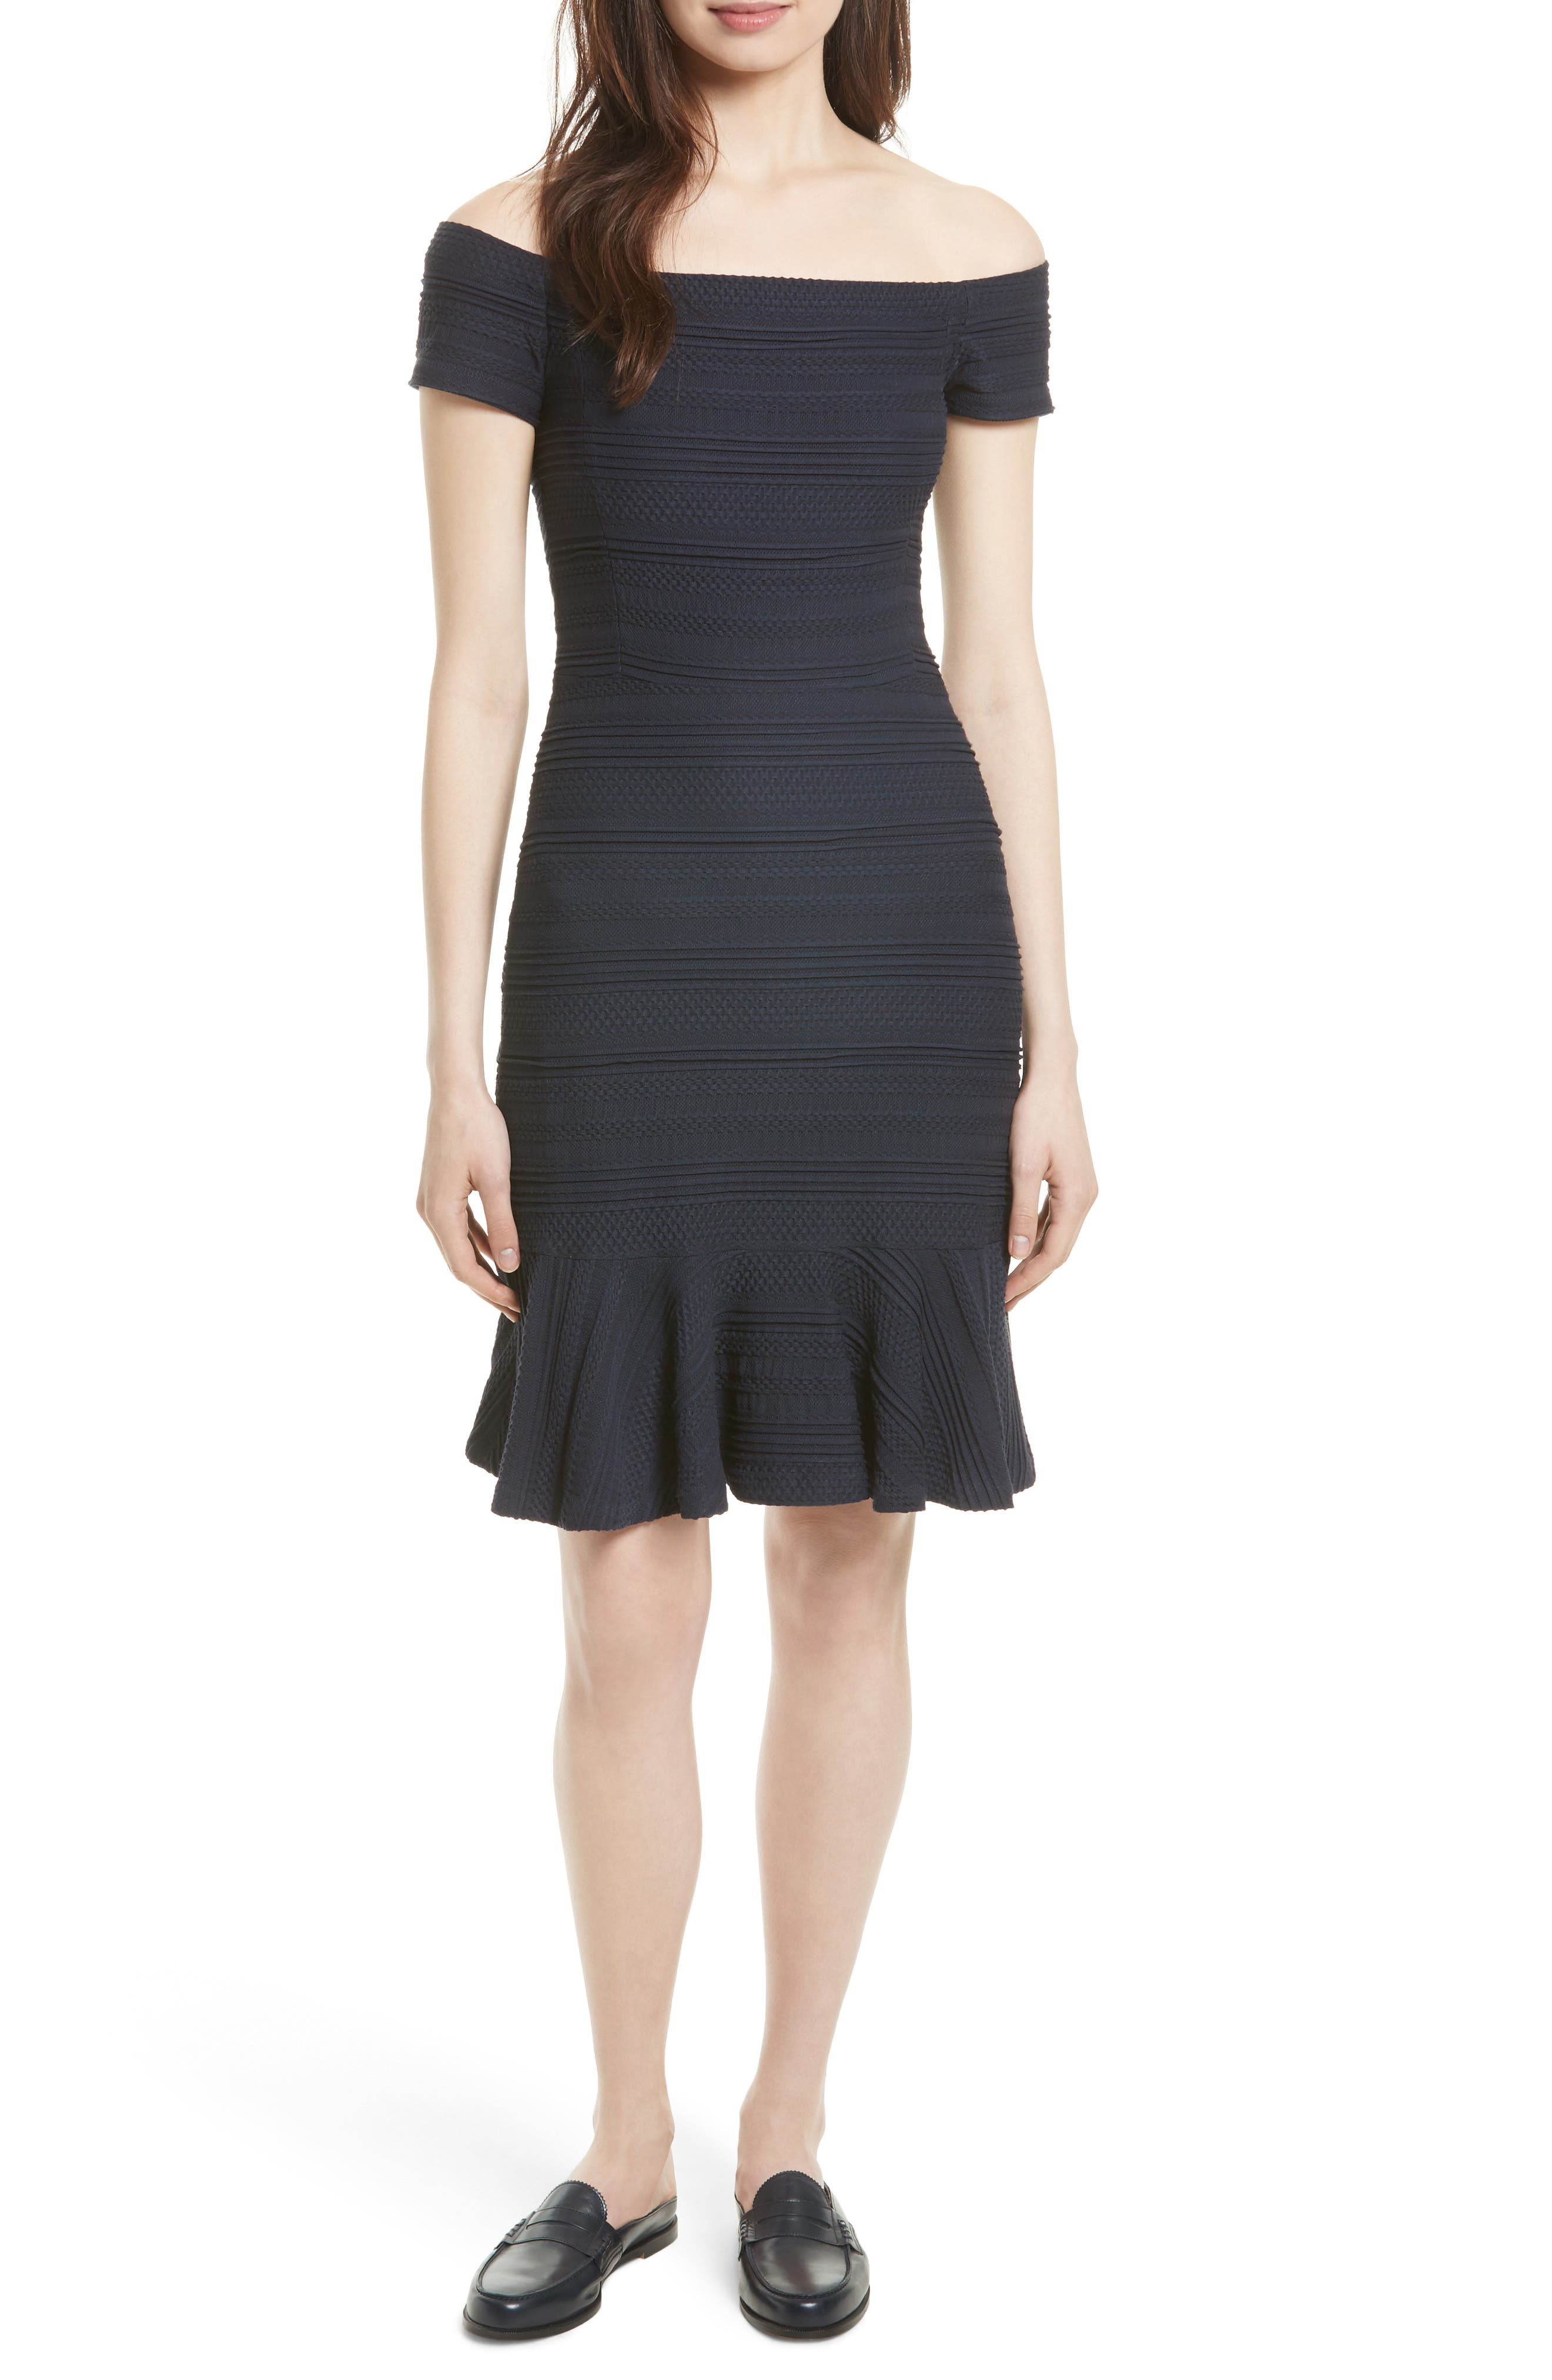 Main Image - Rebecca Taylor Off the Shoulder Textured Knit Dress